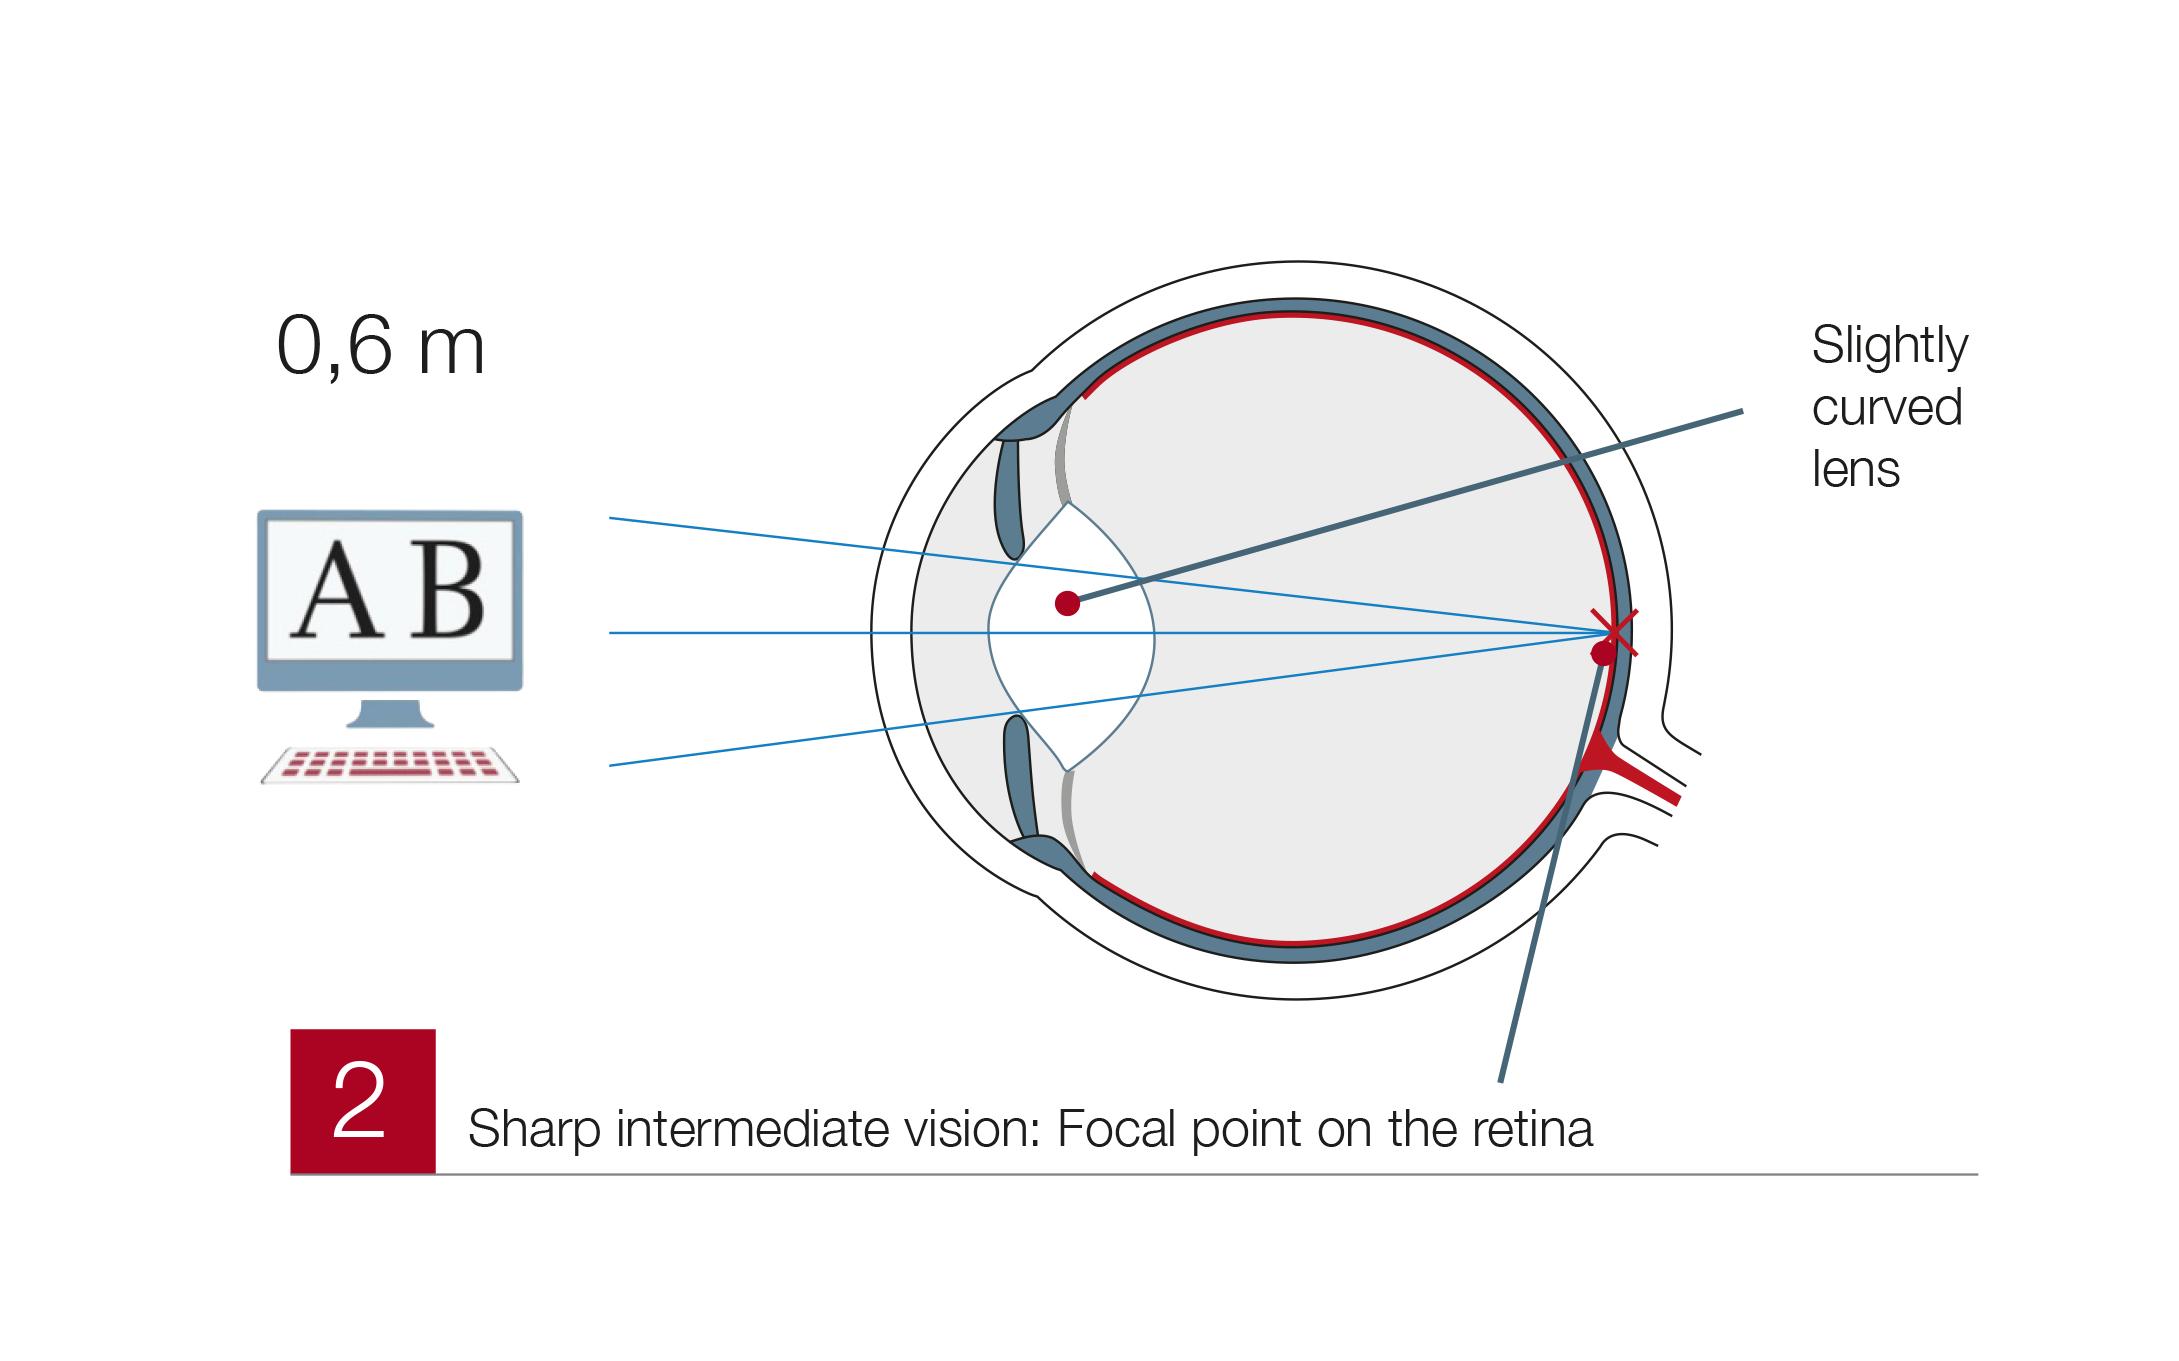 Presbyopia2